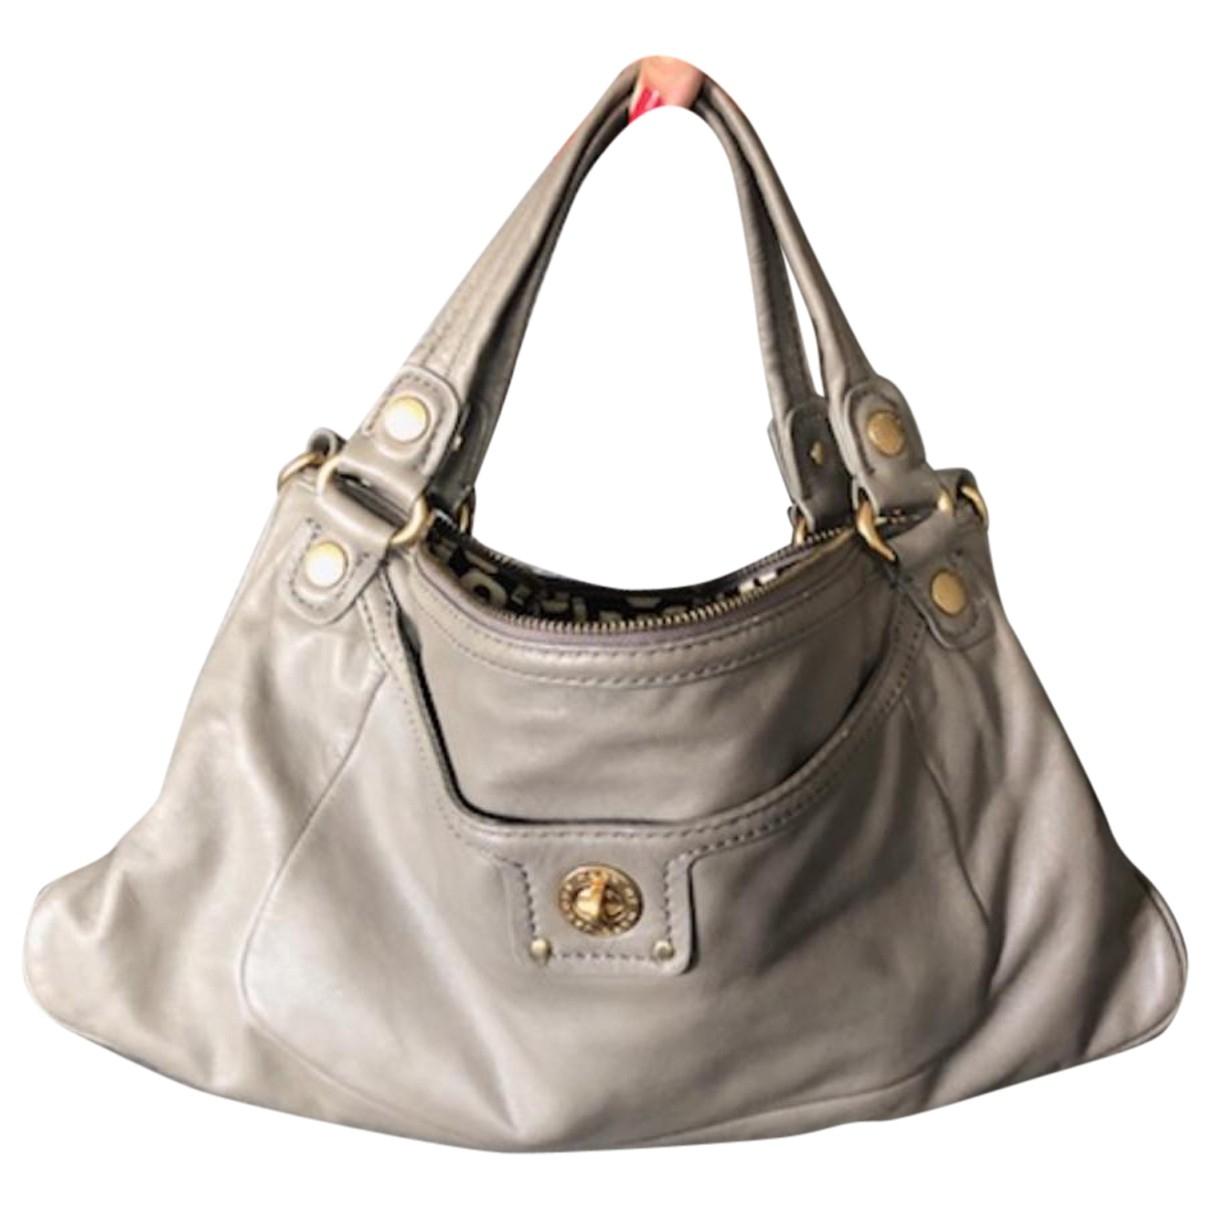 Marc By Marc Jacobs \N Grey Leather handbag for Women \N